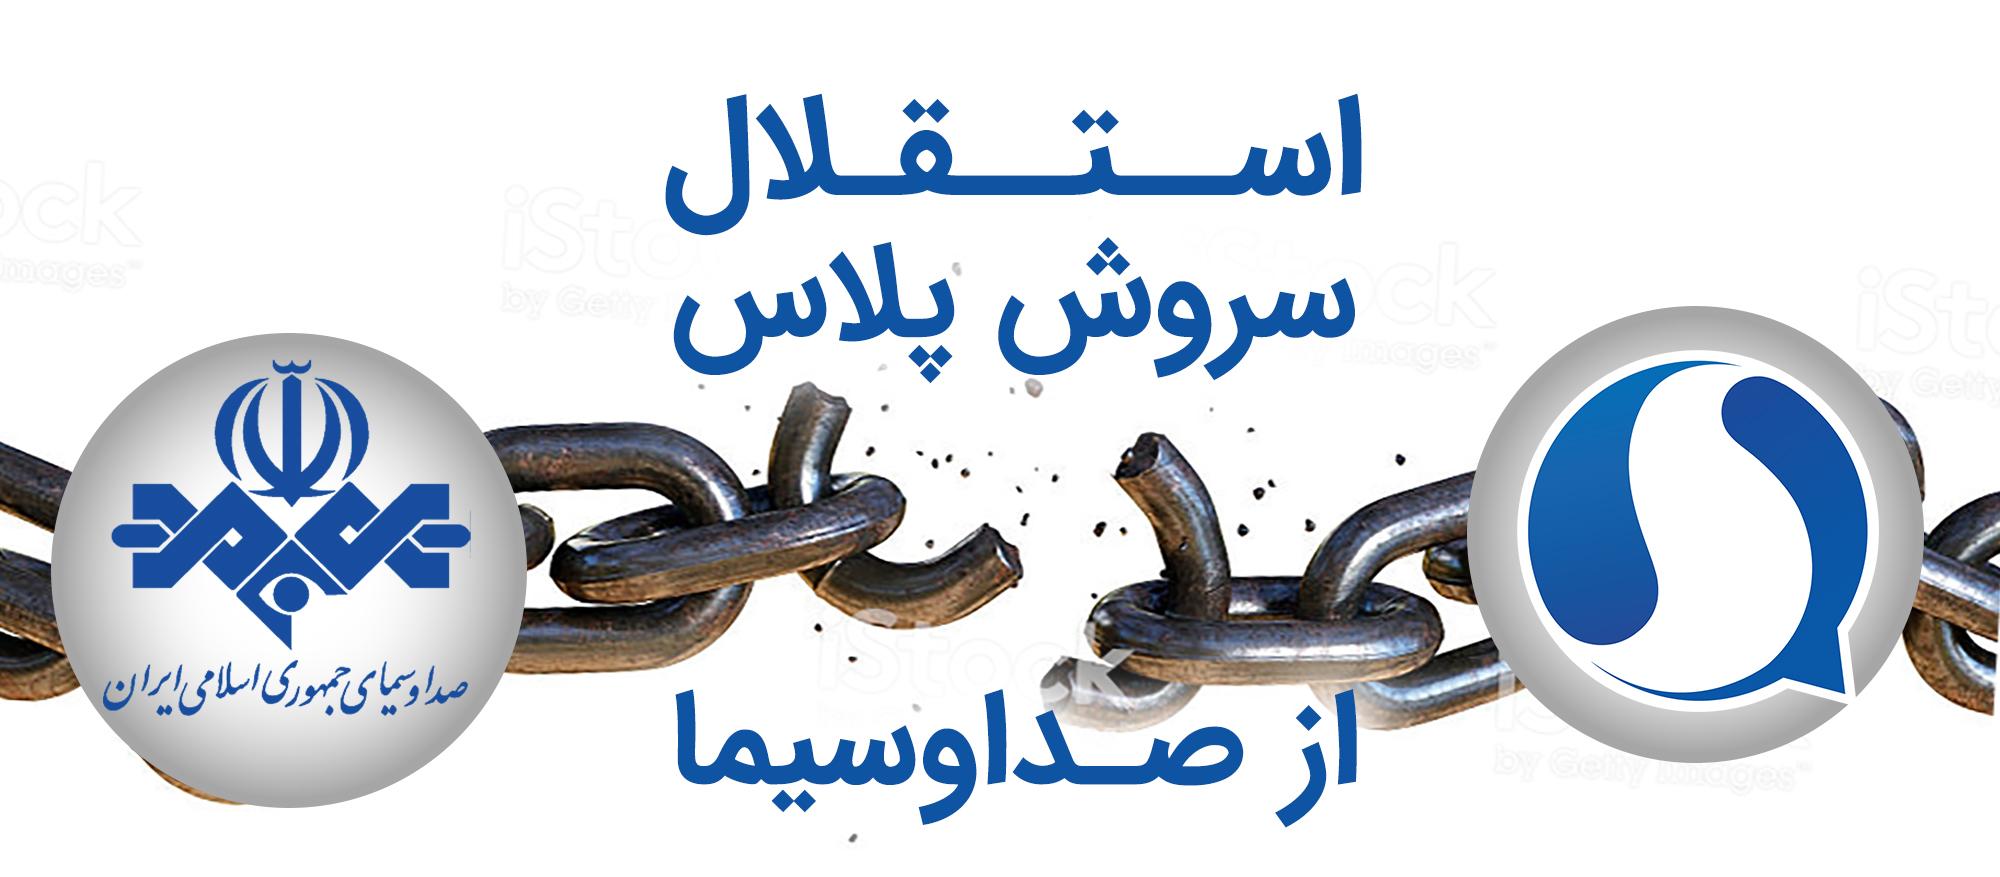 خبر خوب: استقلال پیامرسان سروشپلاس از صداوسیما